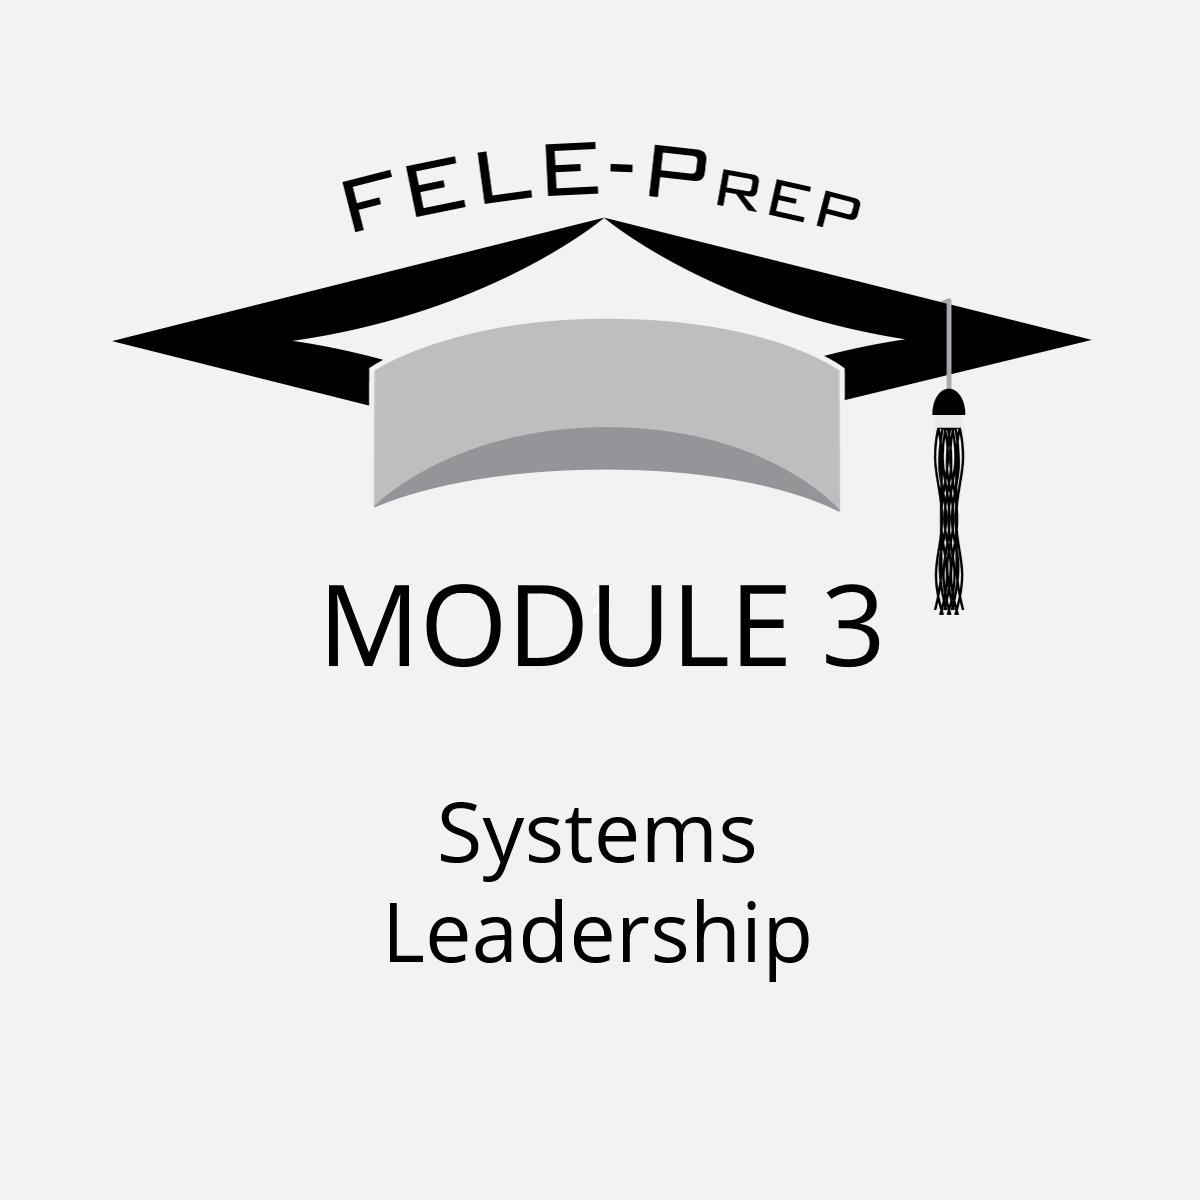 Module 3 – Systems Leadership